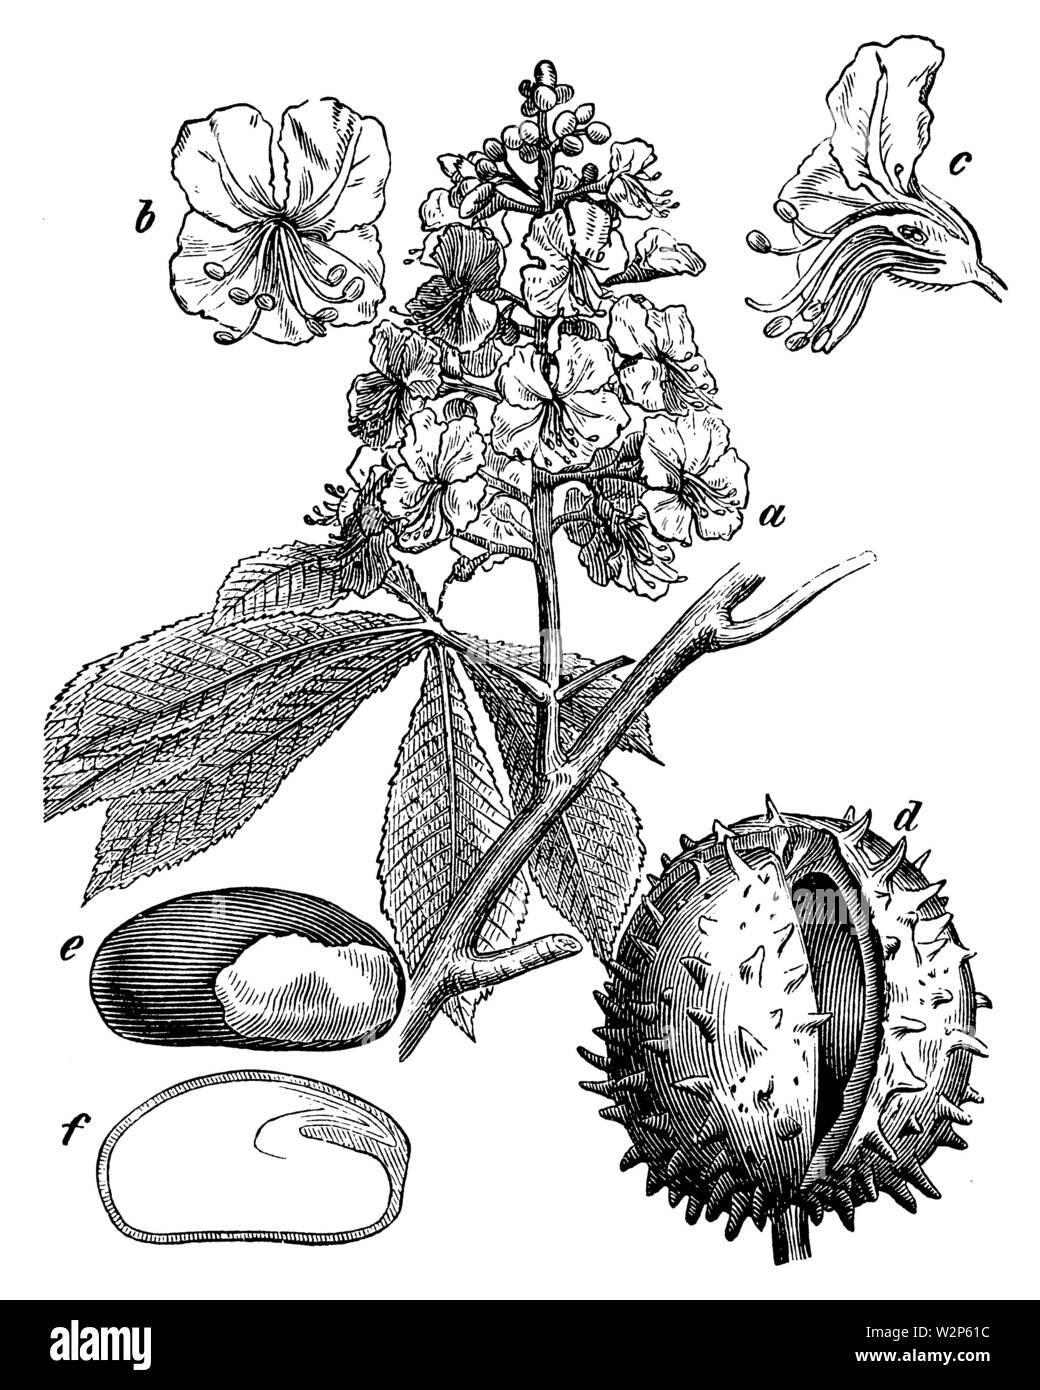 horse-chestnut, conker tree (Aesculus hippocastanum), Aesculus hippocastanum,  (botany book, 1898) - Stock Image